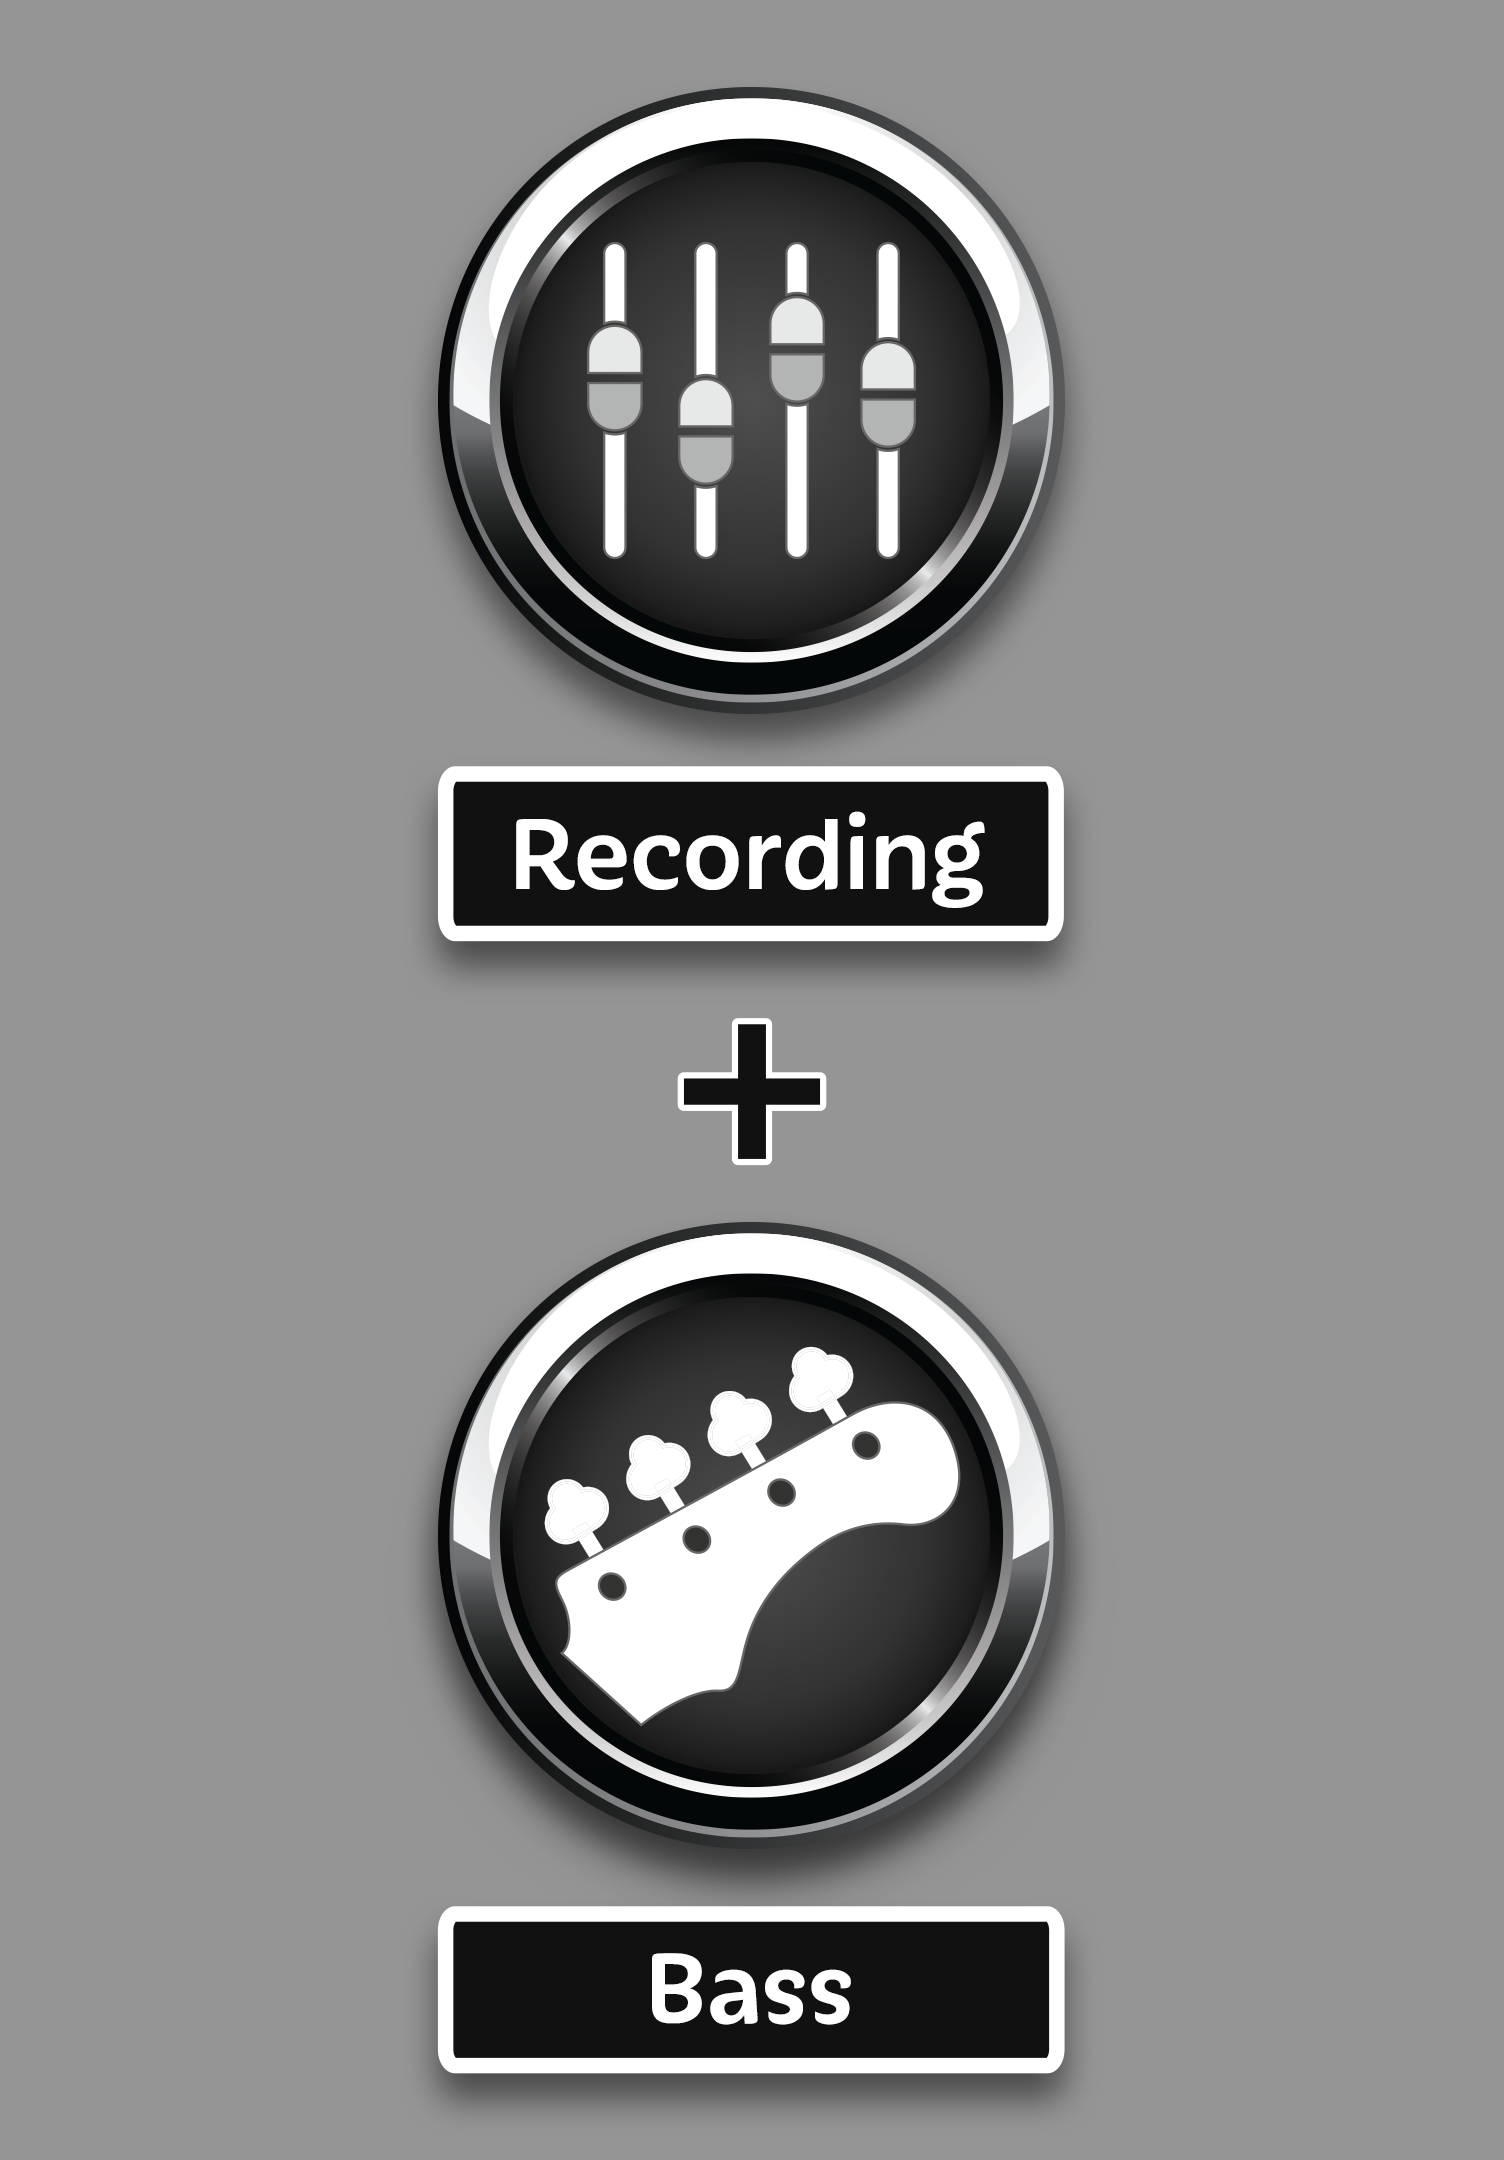 Recording and Bass Guitar Programs Near Me